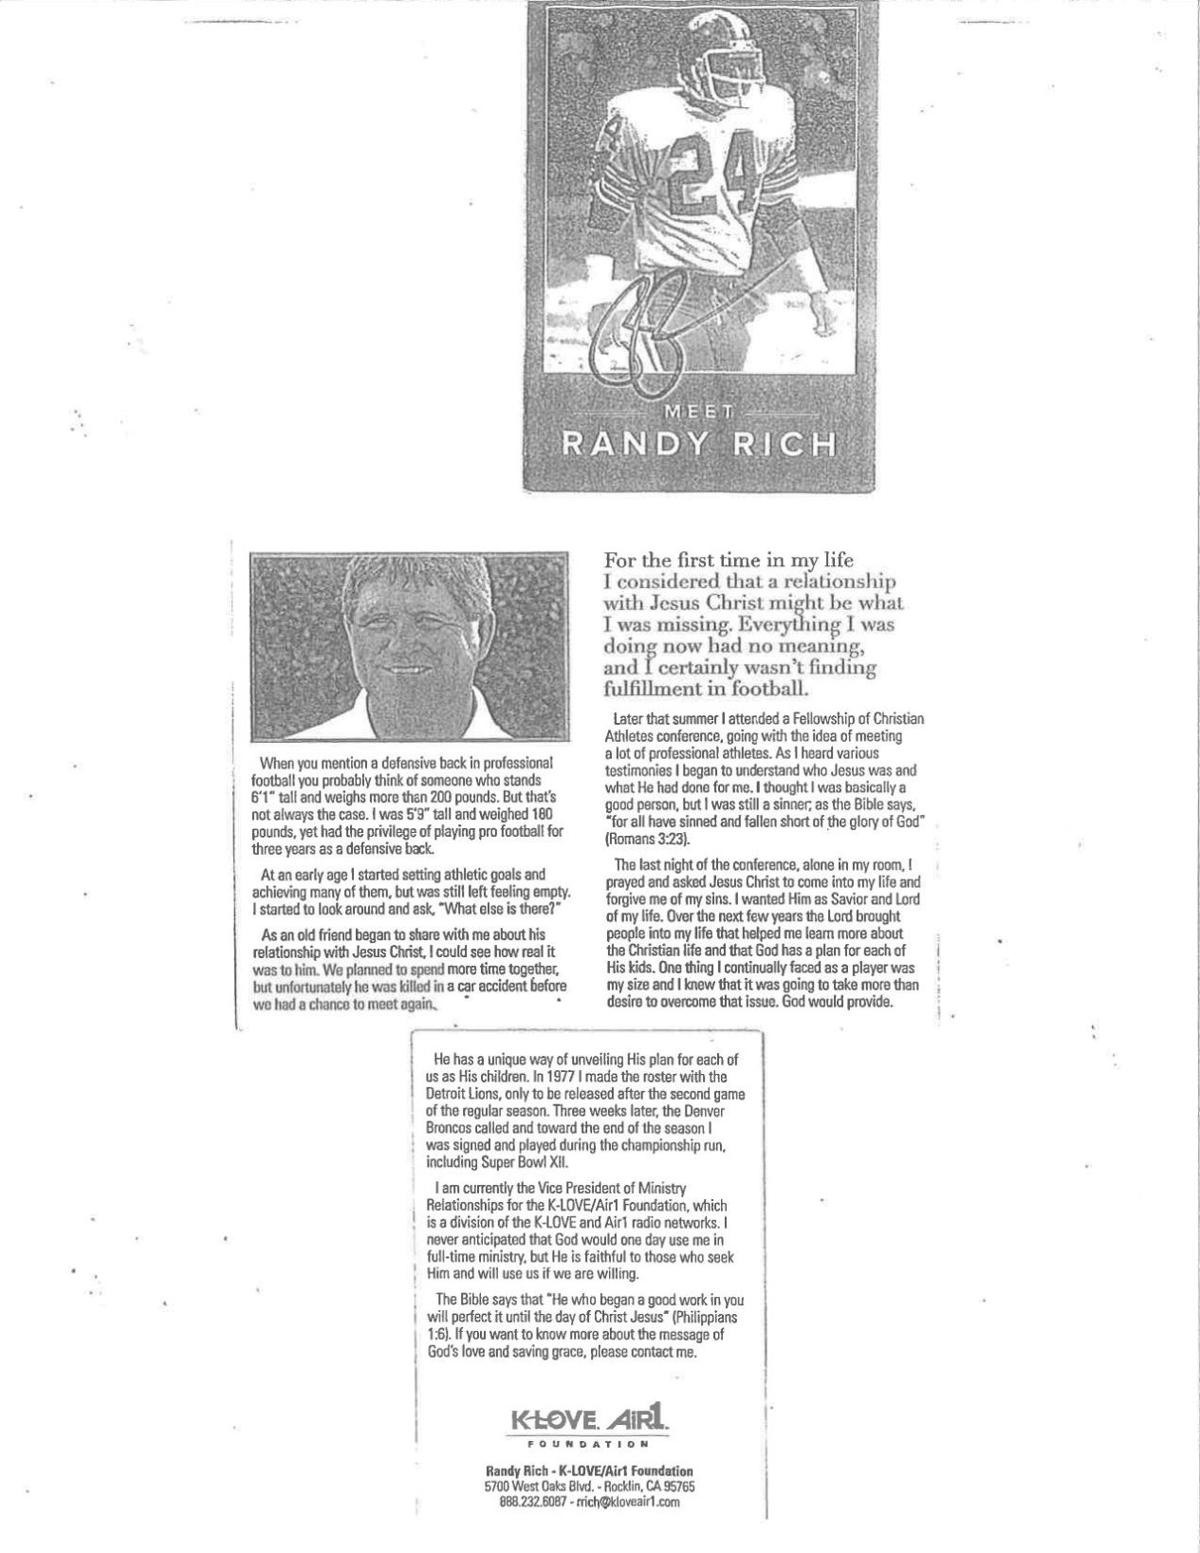 Randy Rich card